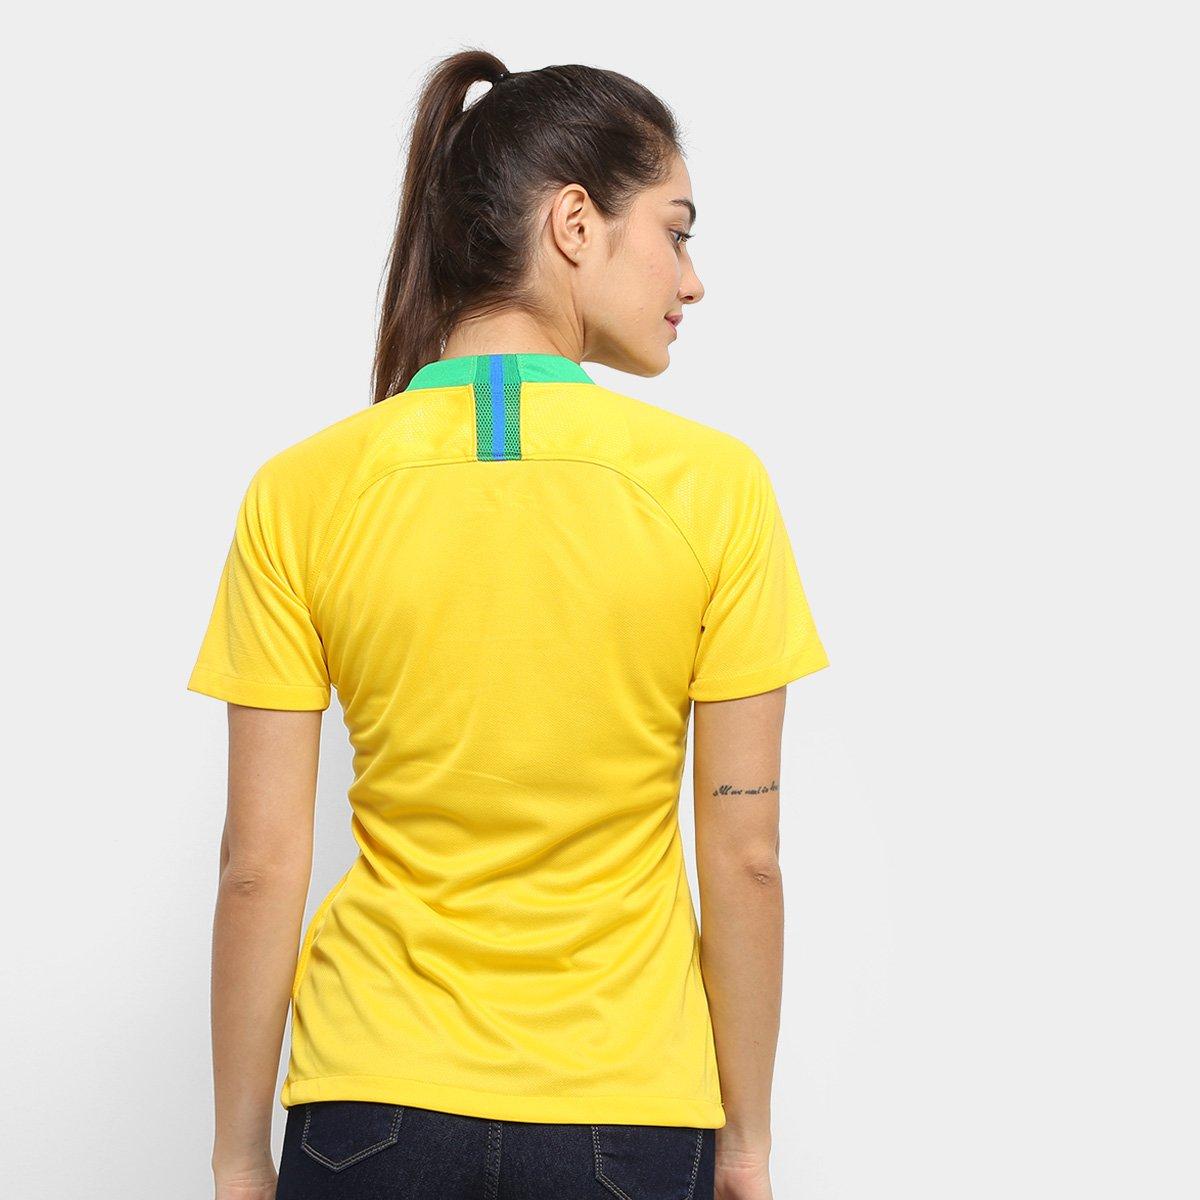 526f704383 Camisa Seleção Brasil I 2018 s n° - Torcedor Nike Feminina - Amarelo ...